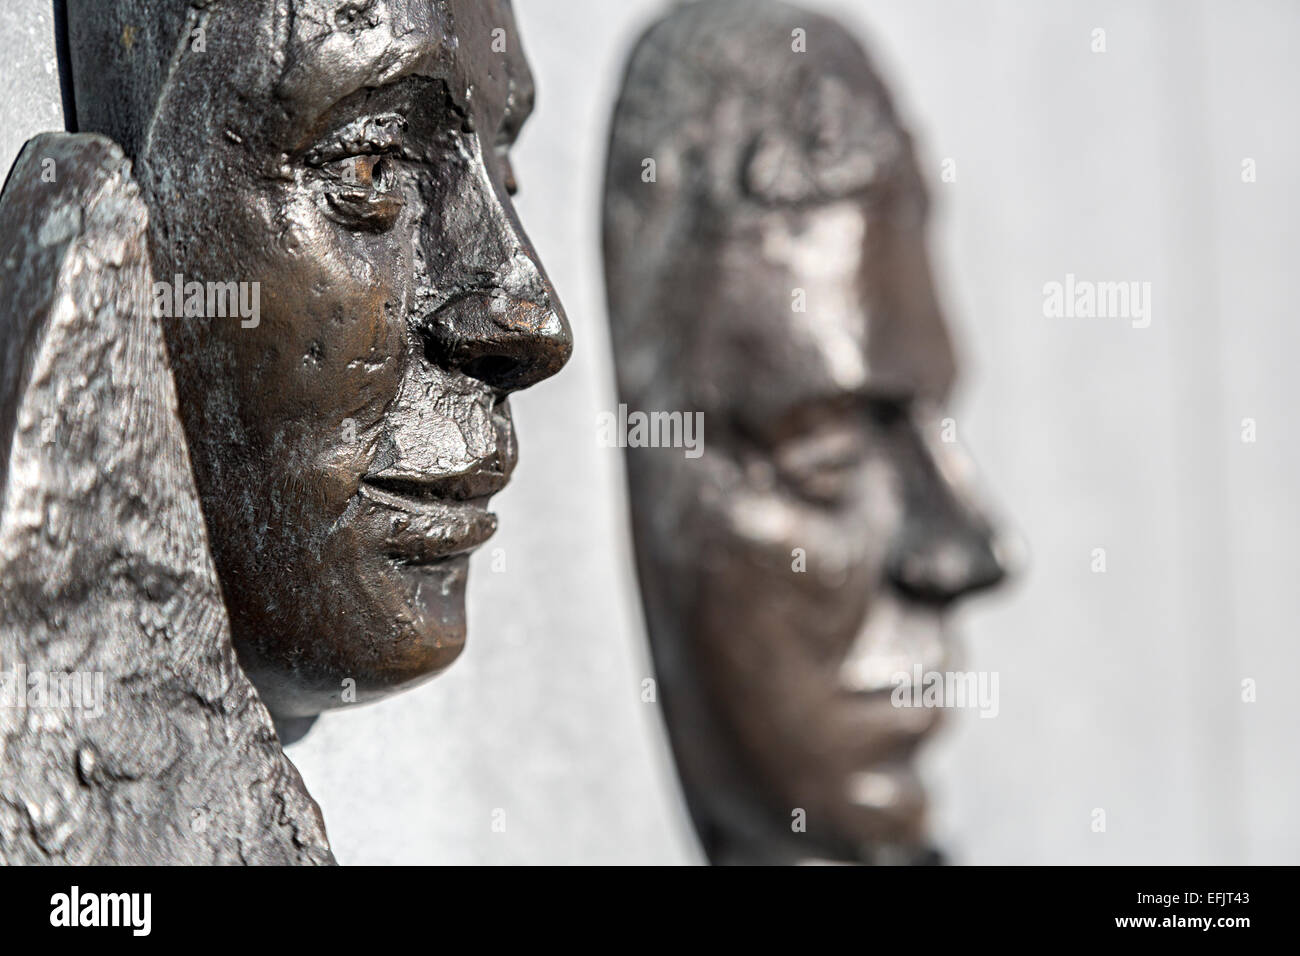 Rostros en bronce en el John F. Kennedy Memorial en muelle en New Ross, Co. Wexford, República de Irlanda Imagen De Stock